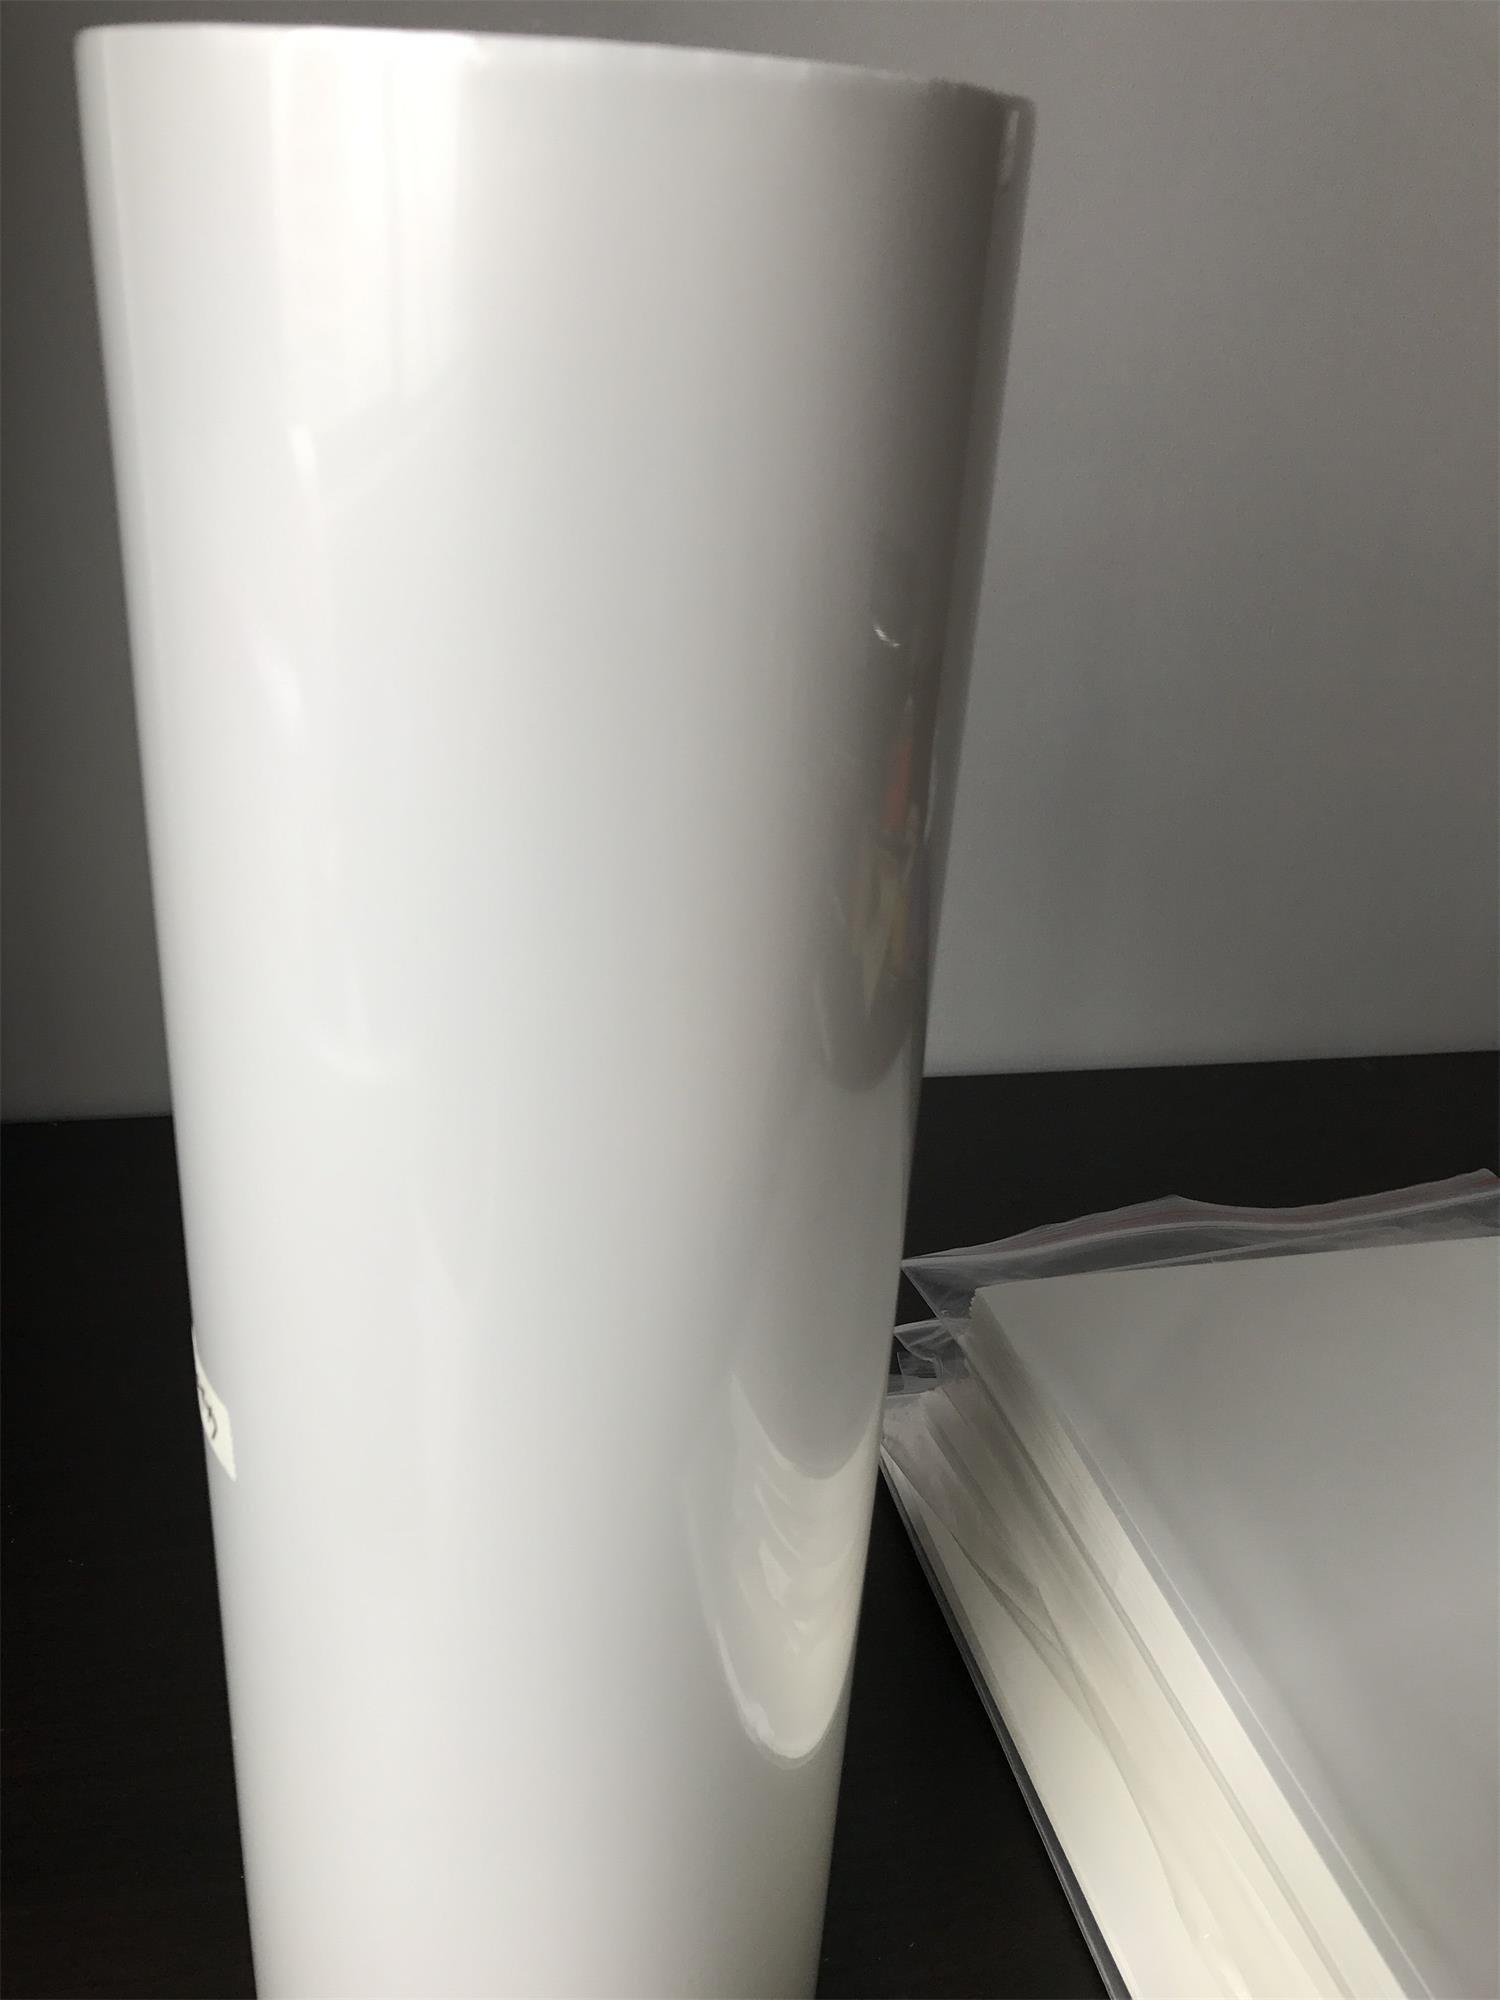 Hydrographics Film - Blank Water Transfer Printing Film - 0.42x5M (16.5'' Width) Size Blank Water Transfer Printing Film - Blank Water Transfer Film